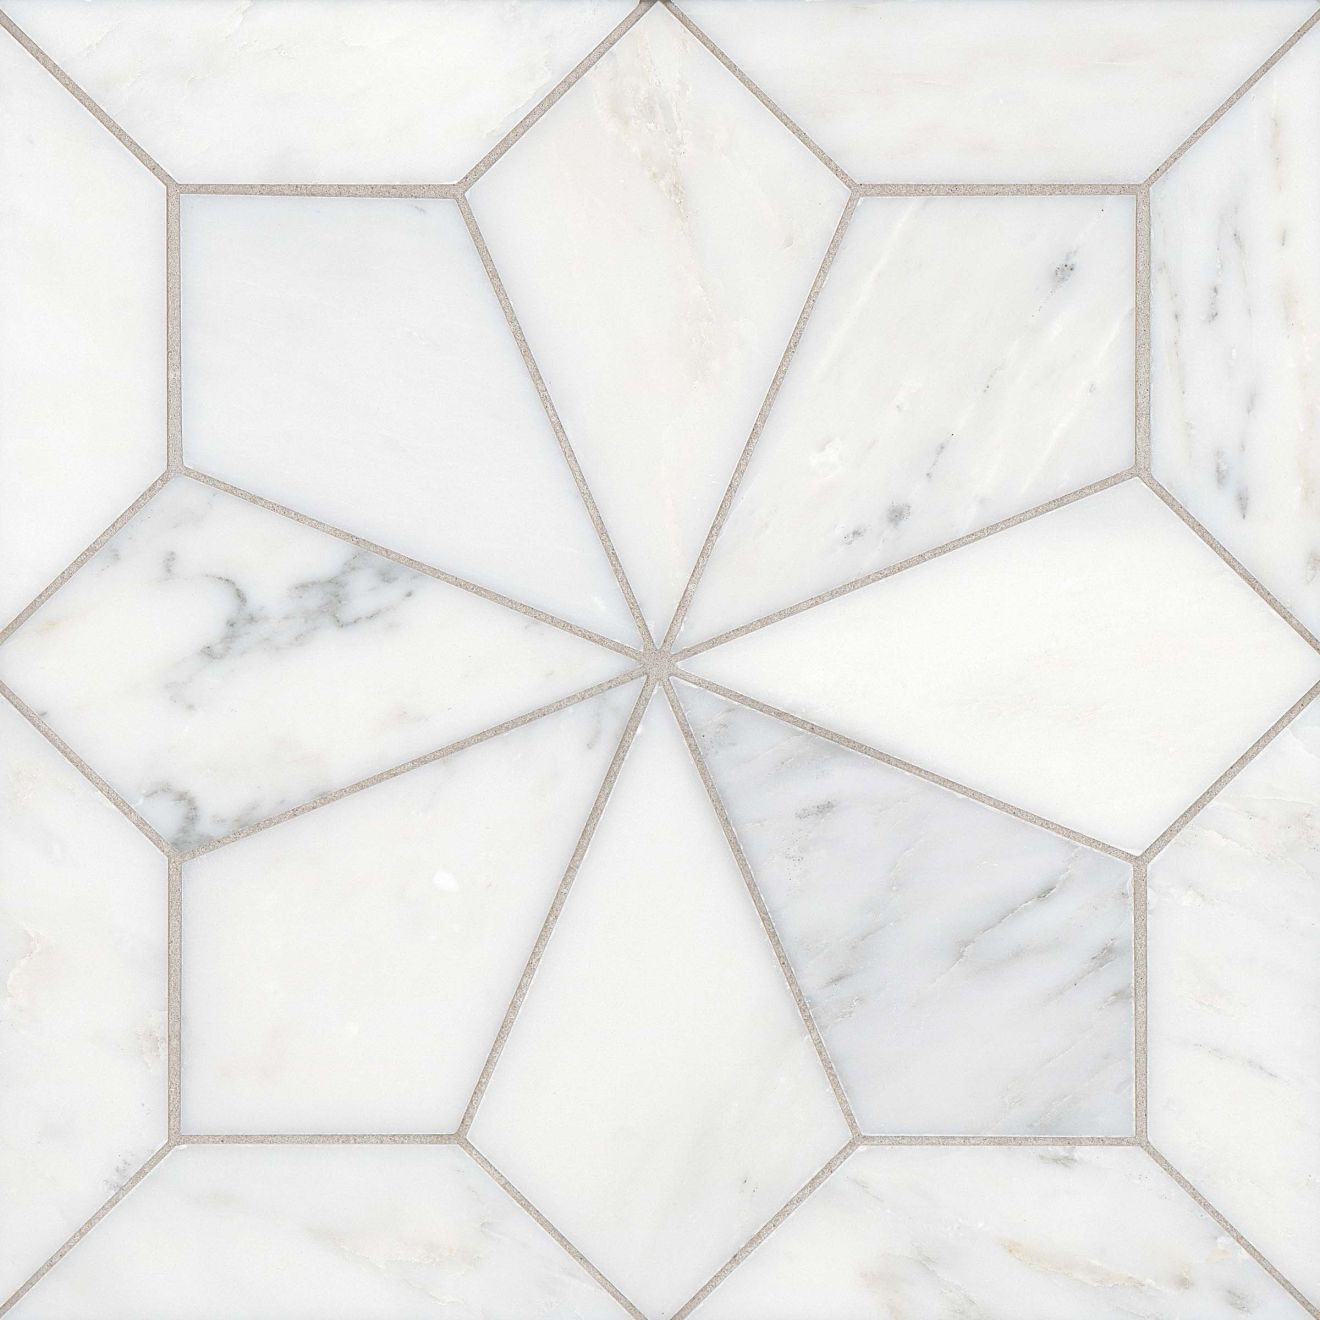 Blomma Floor & Wall Mosaic in Bianco